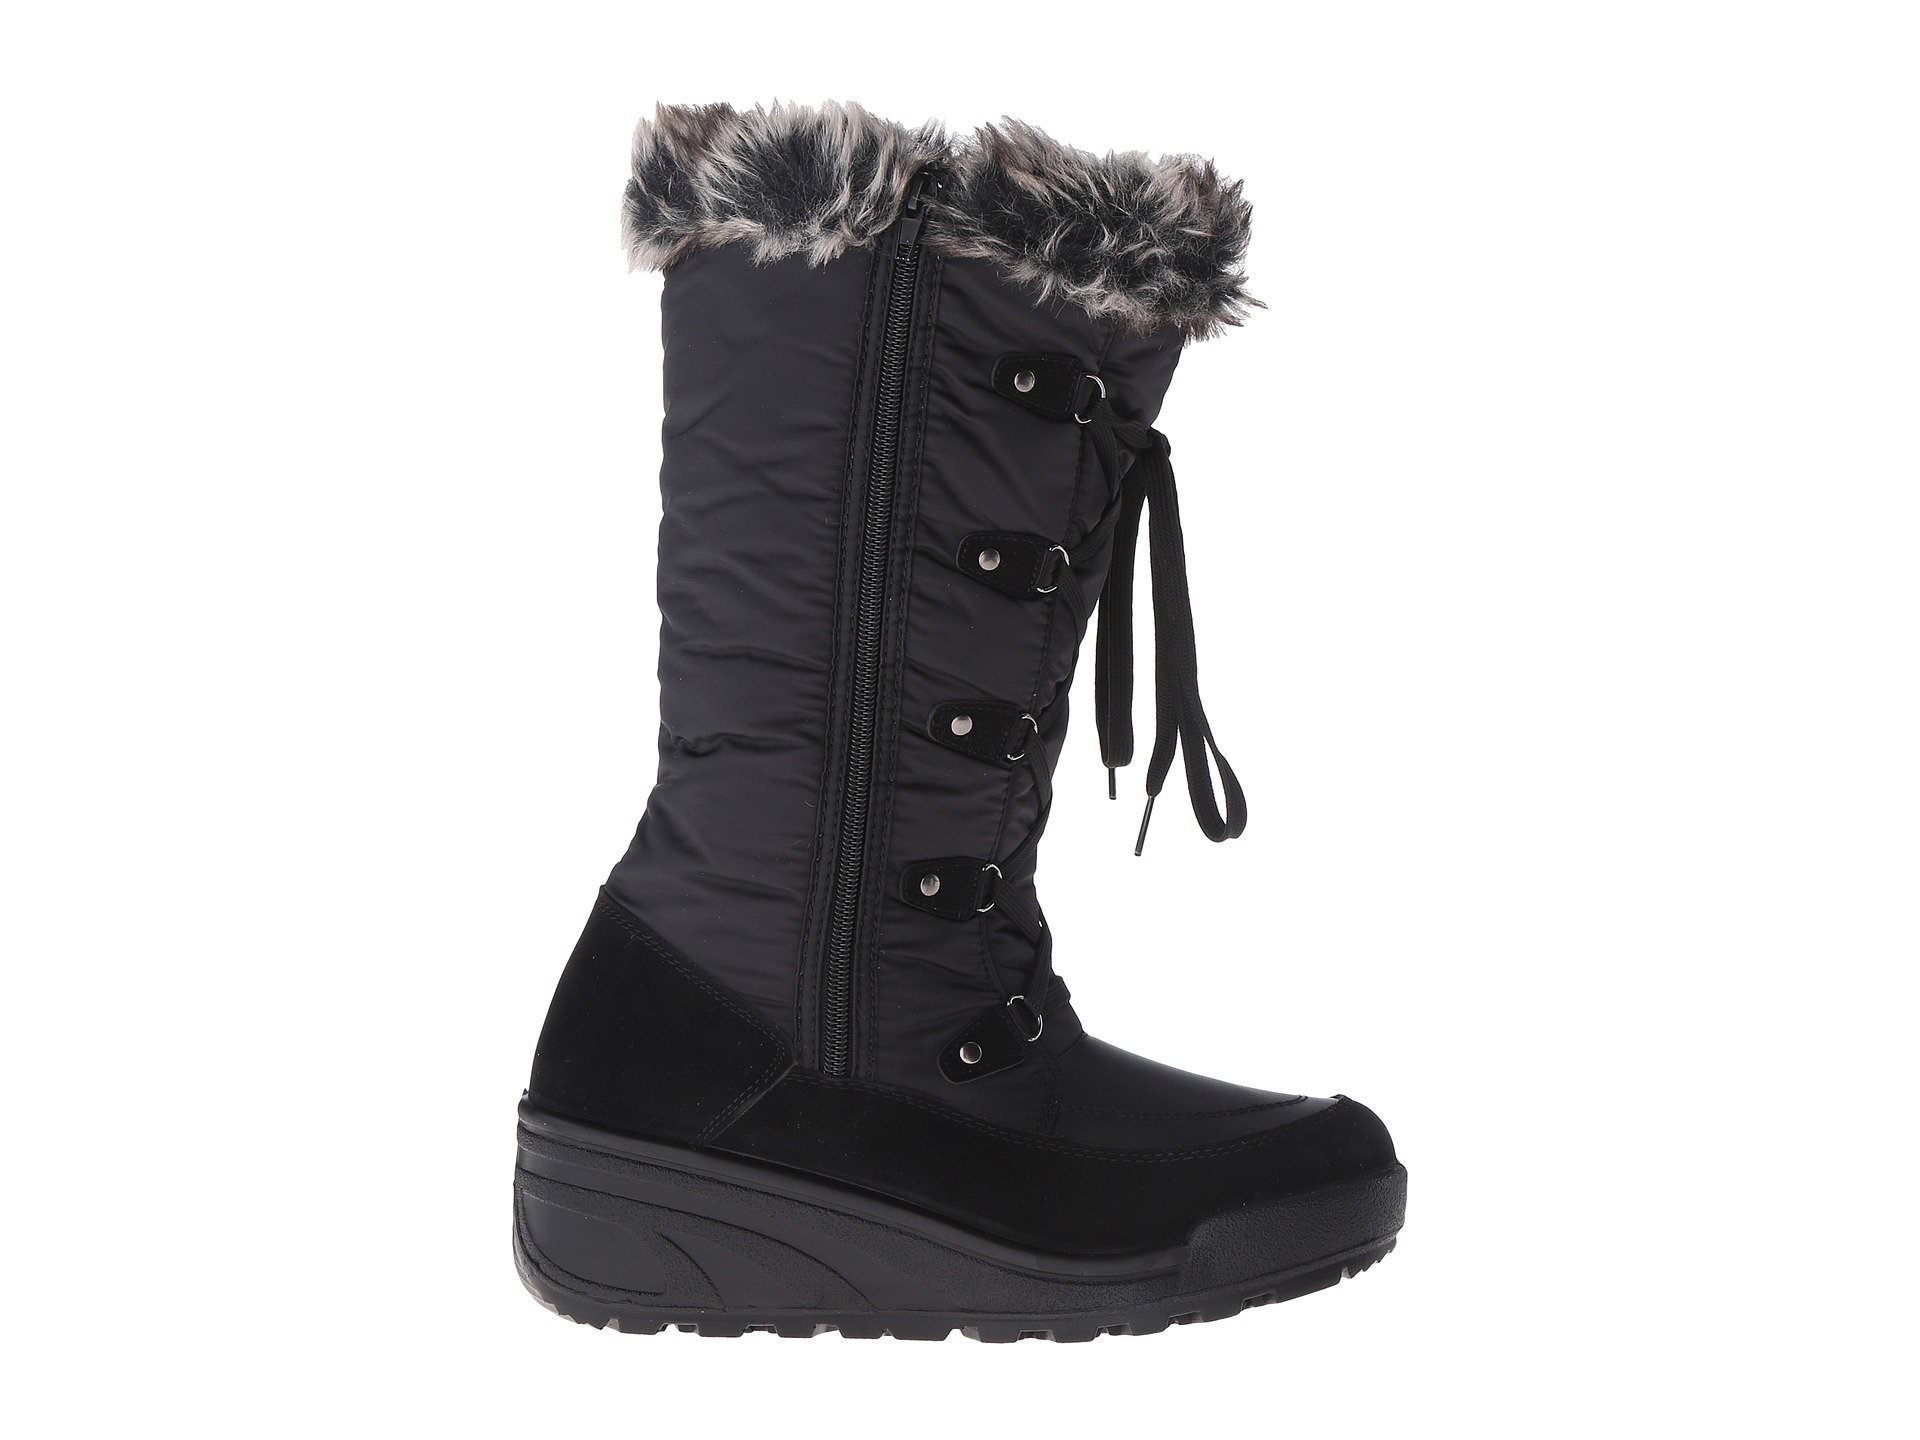 Spring Step Zip NORTHRIDGE Womens Black Warm Winter Zip Step Up Snow Boots 7a4df1